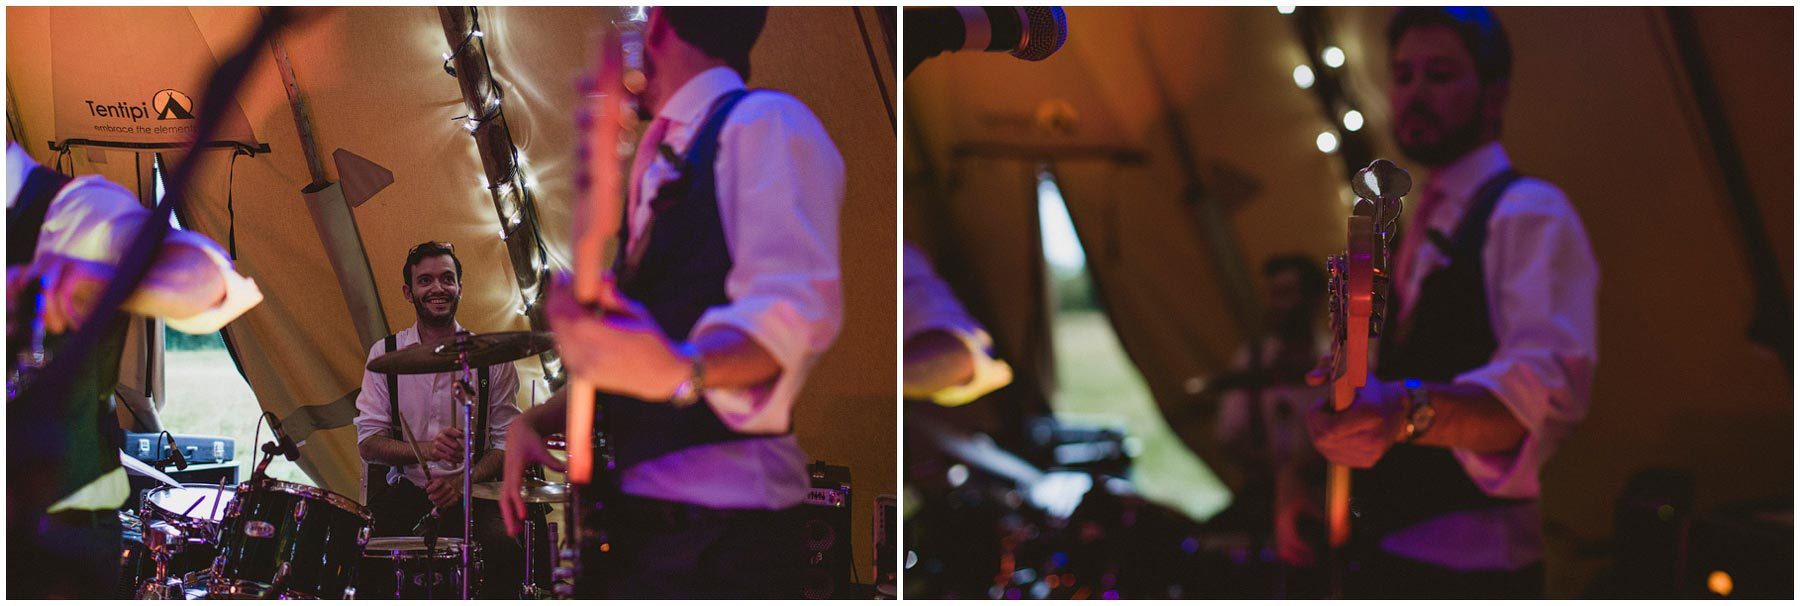 Kent-Festival-Tipi-wedding-photography_0180